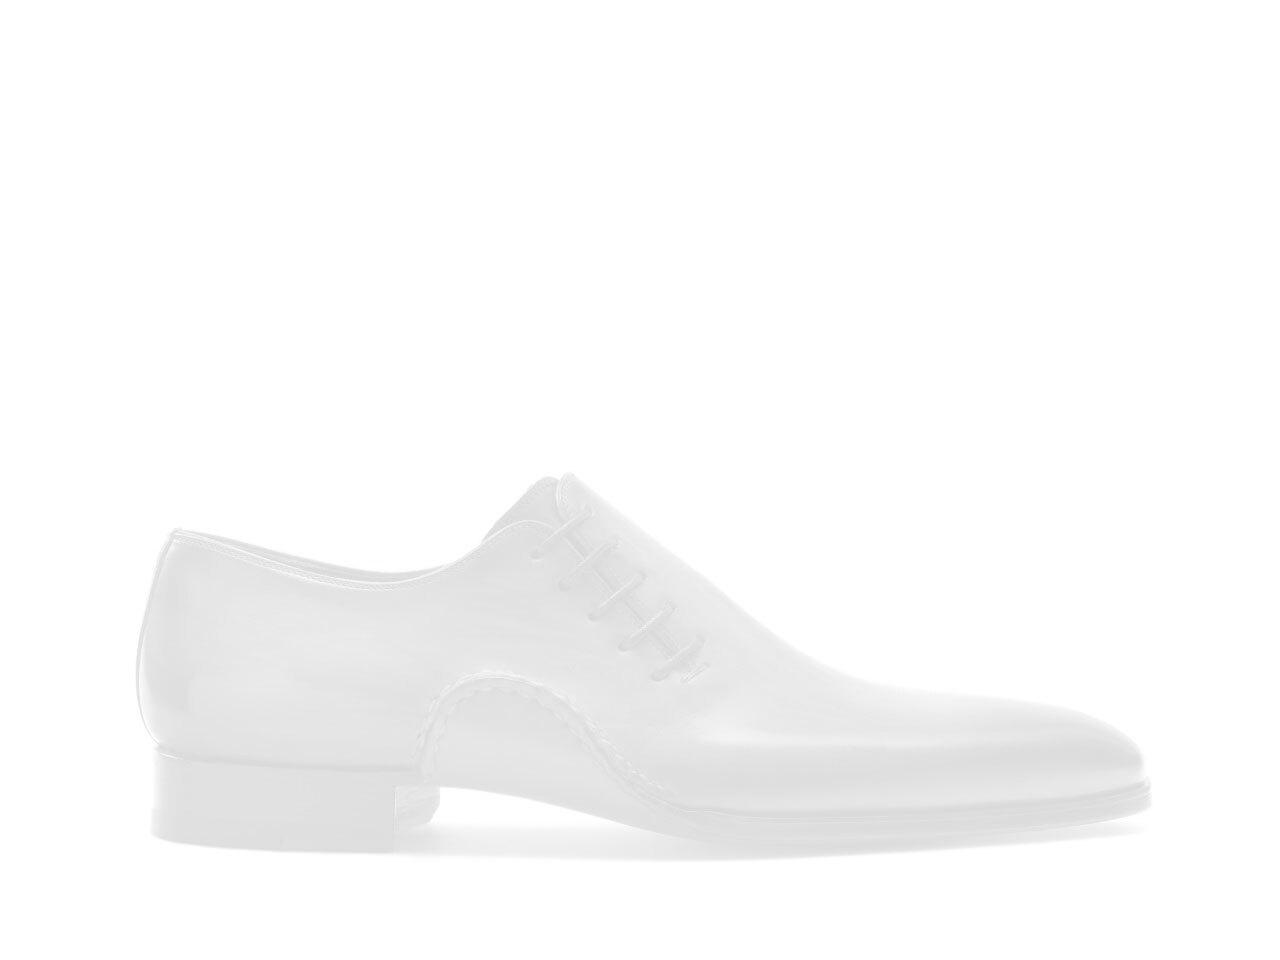 Pair of the Magnanni Echo Lo II Navy Men's Sneakers